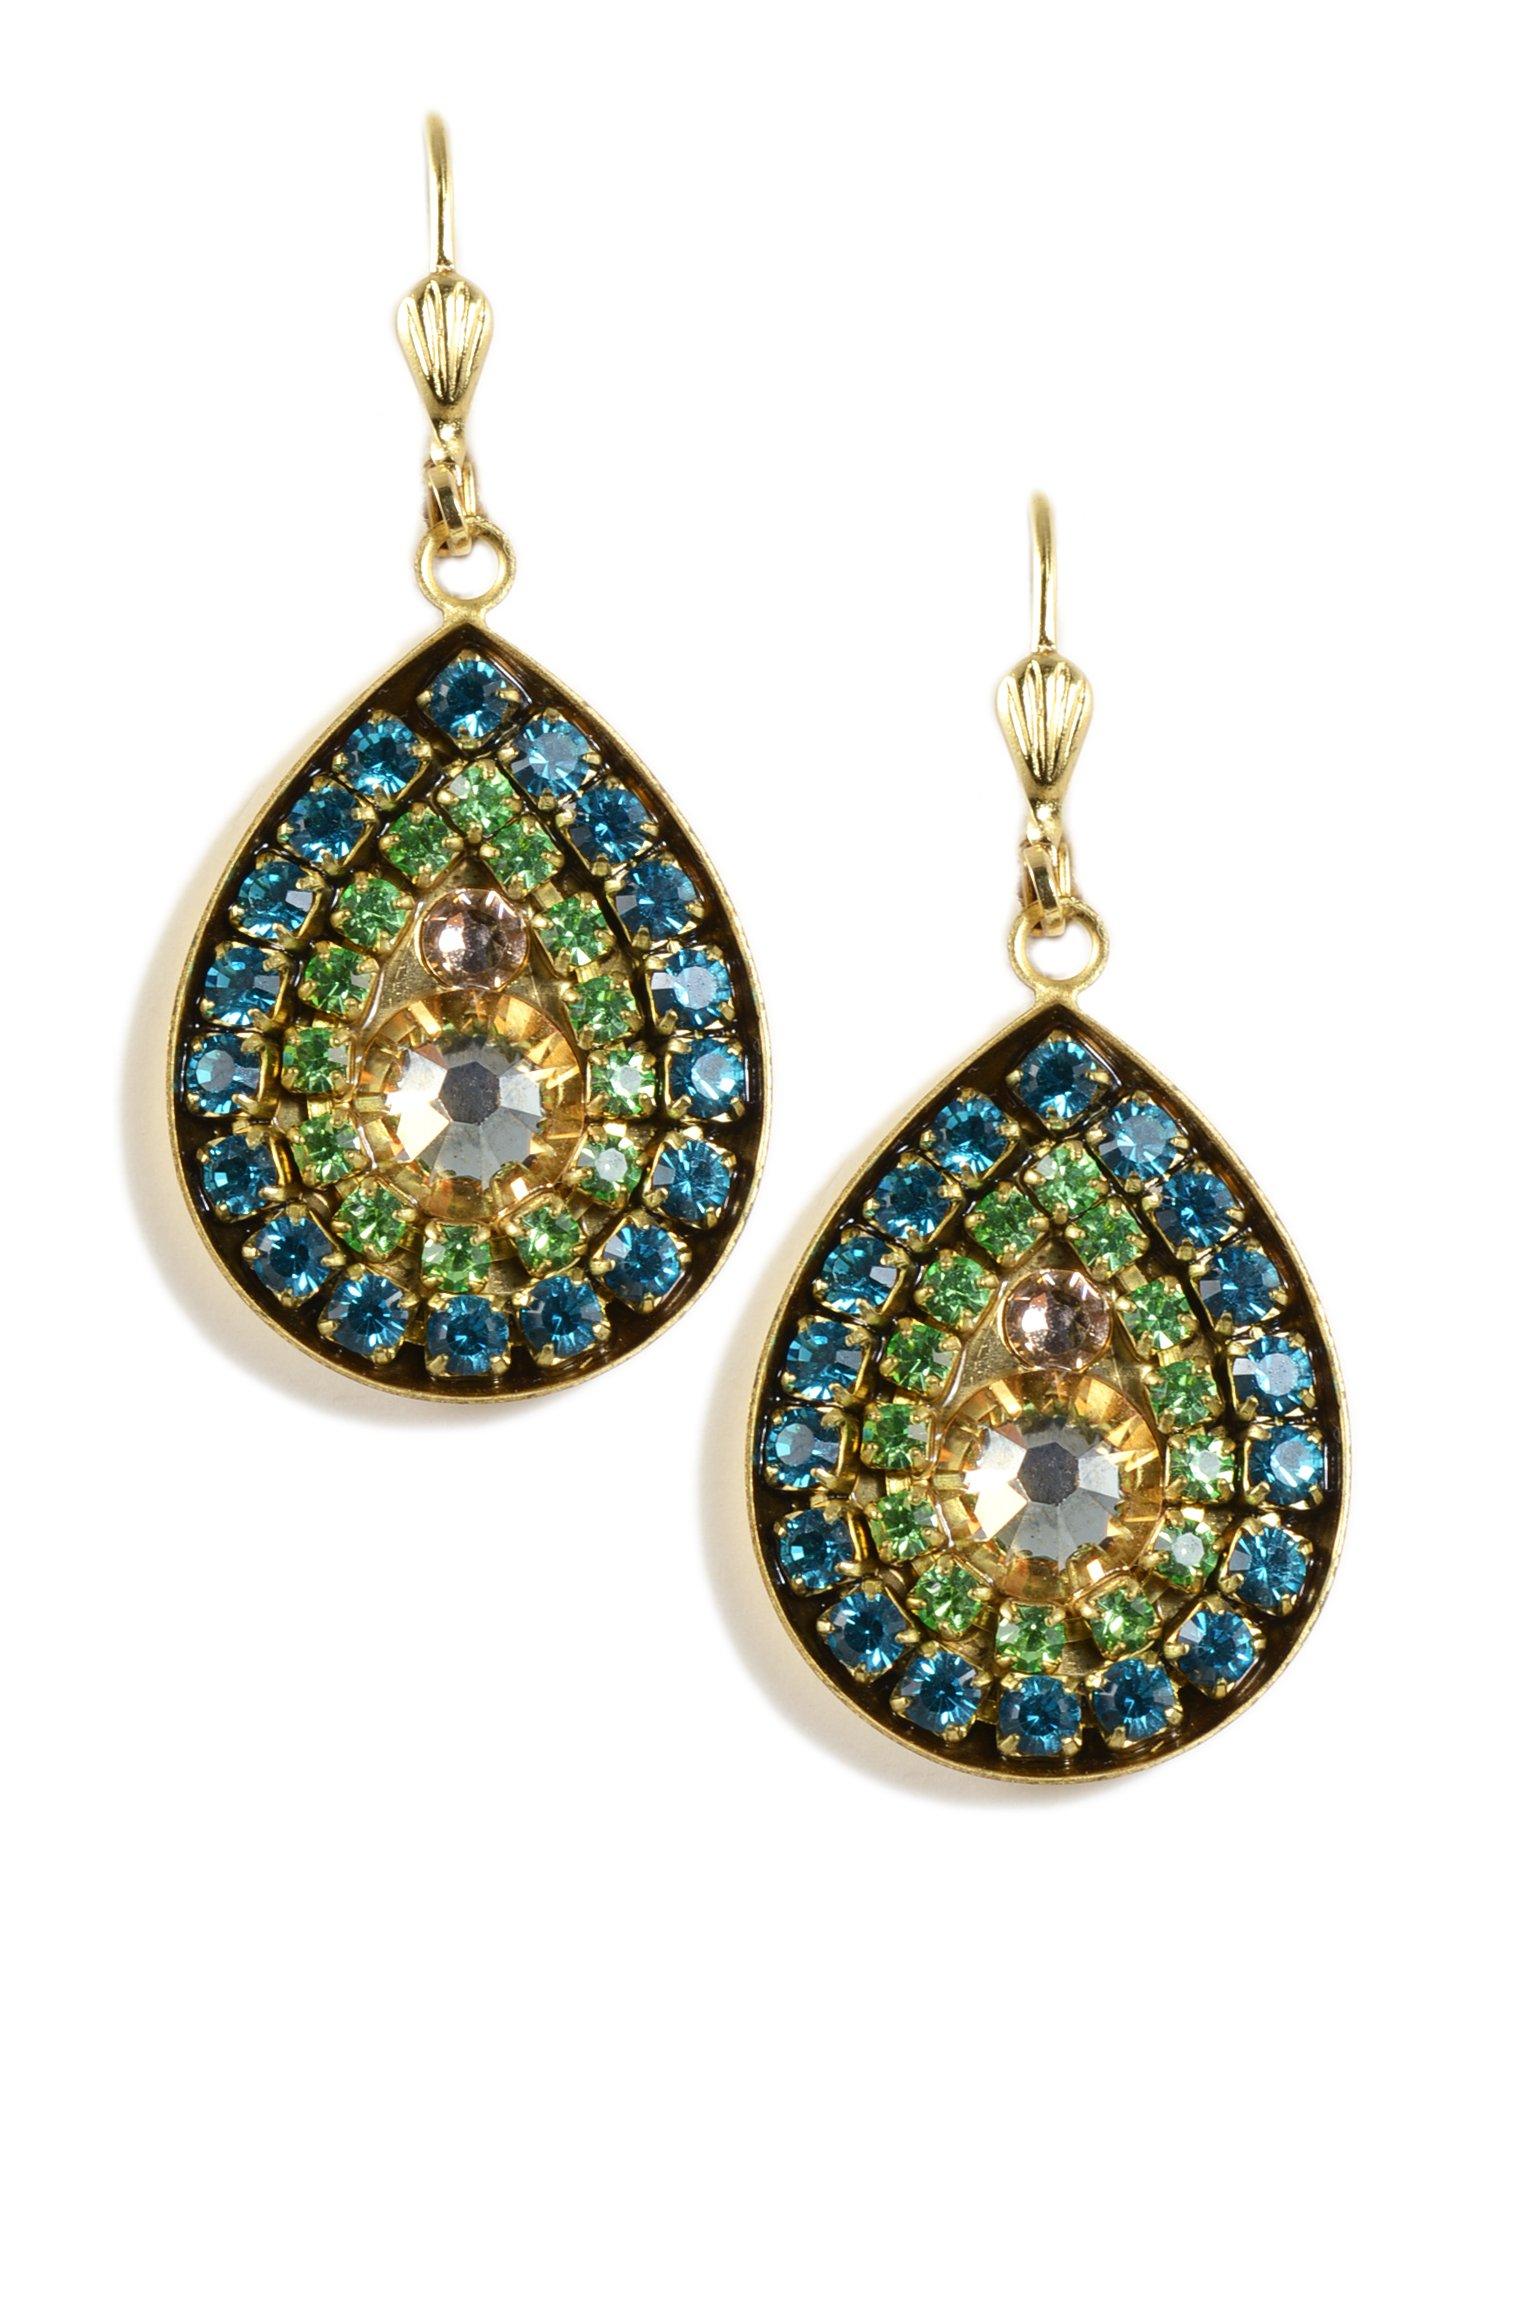 Clara Beau Blue Green Swarovski Glass Crystal TearDrop Mosaic Goldtone Earrings EAM159